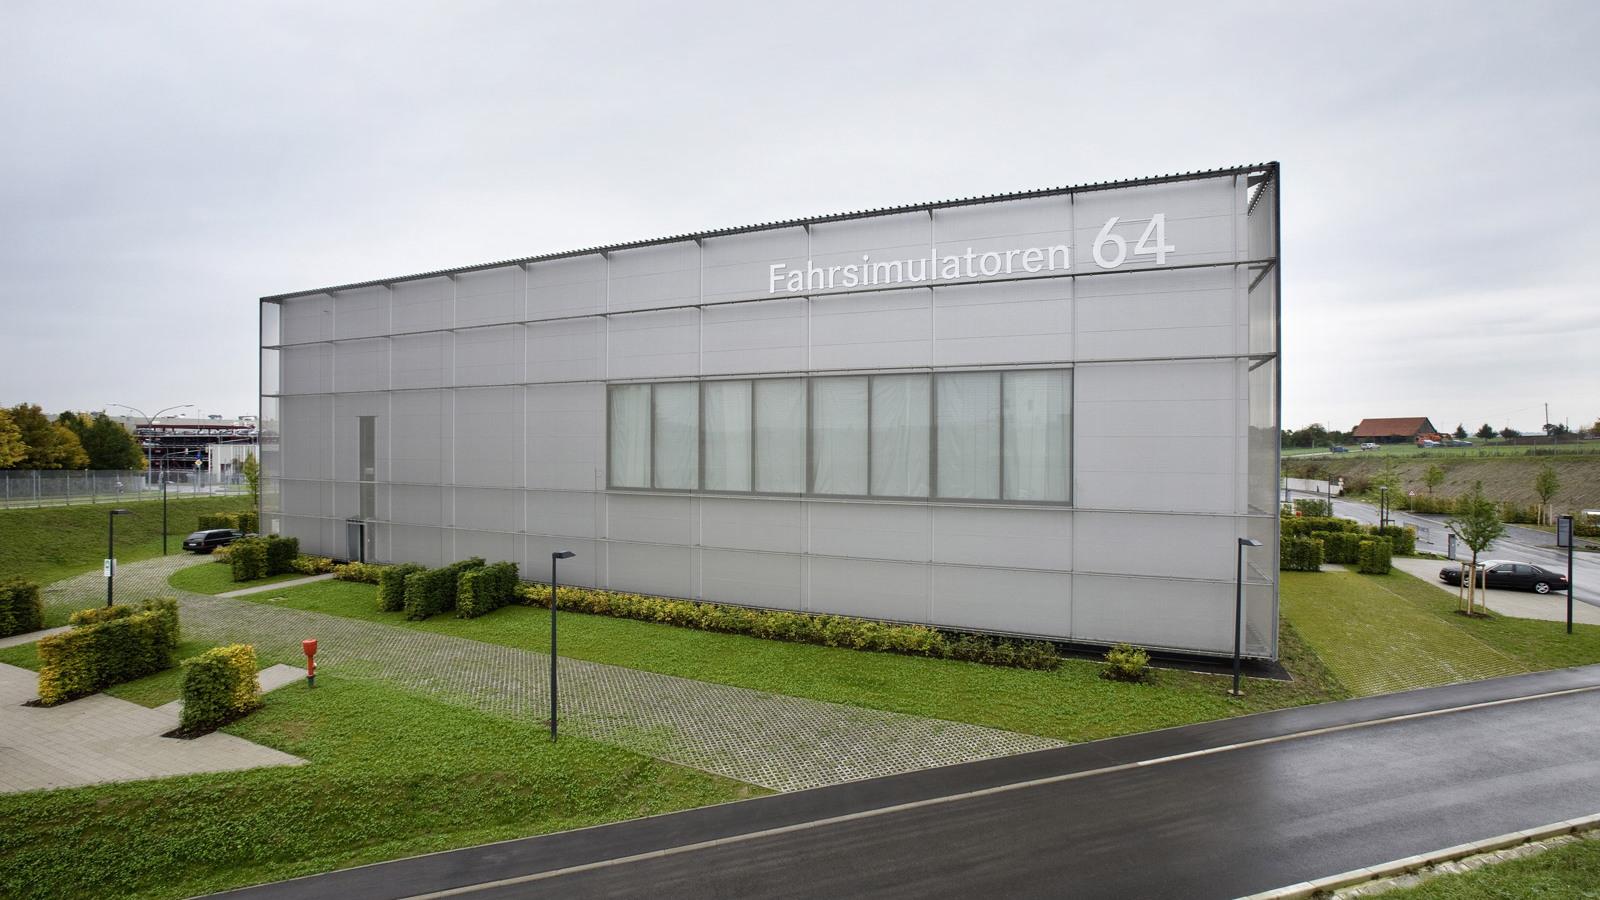 Mercedes-Benz vehicle simulation center